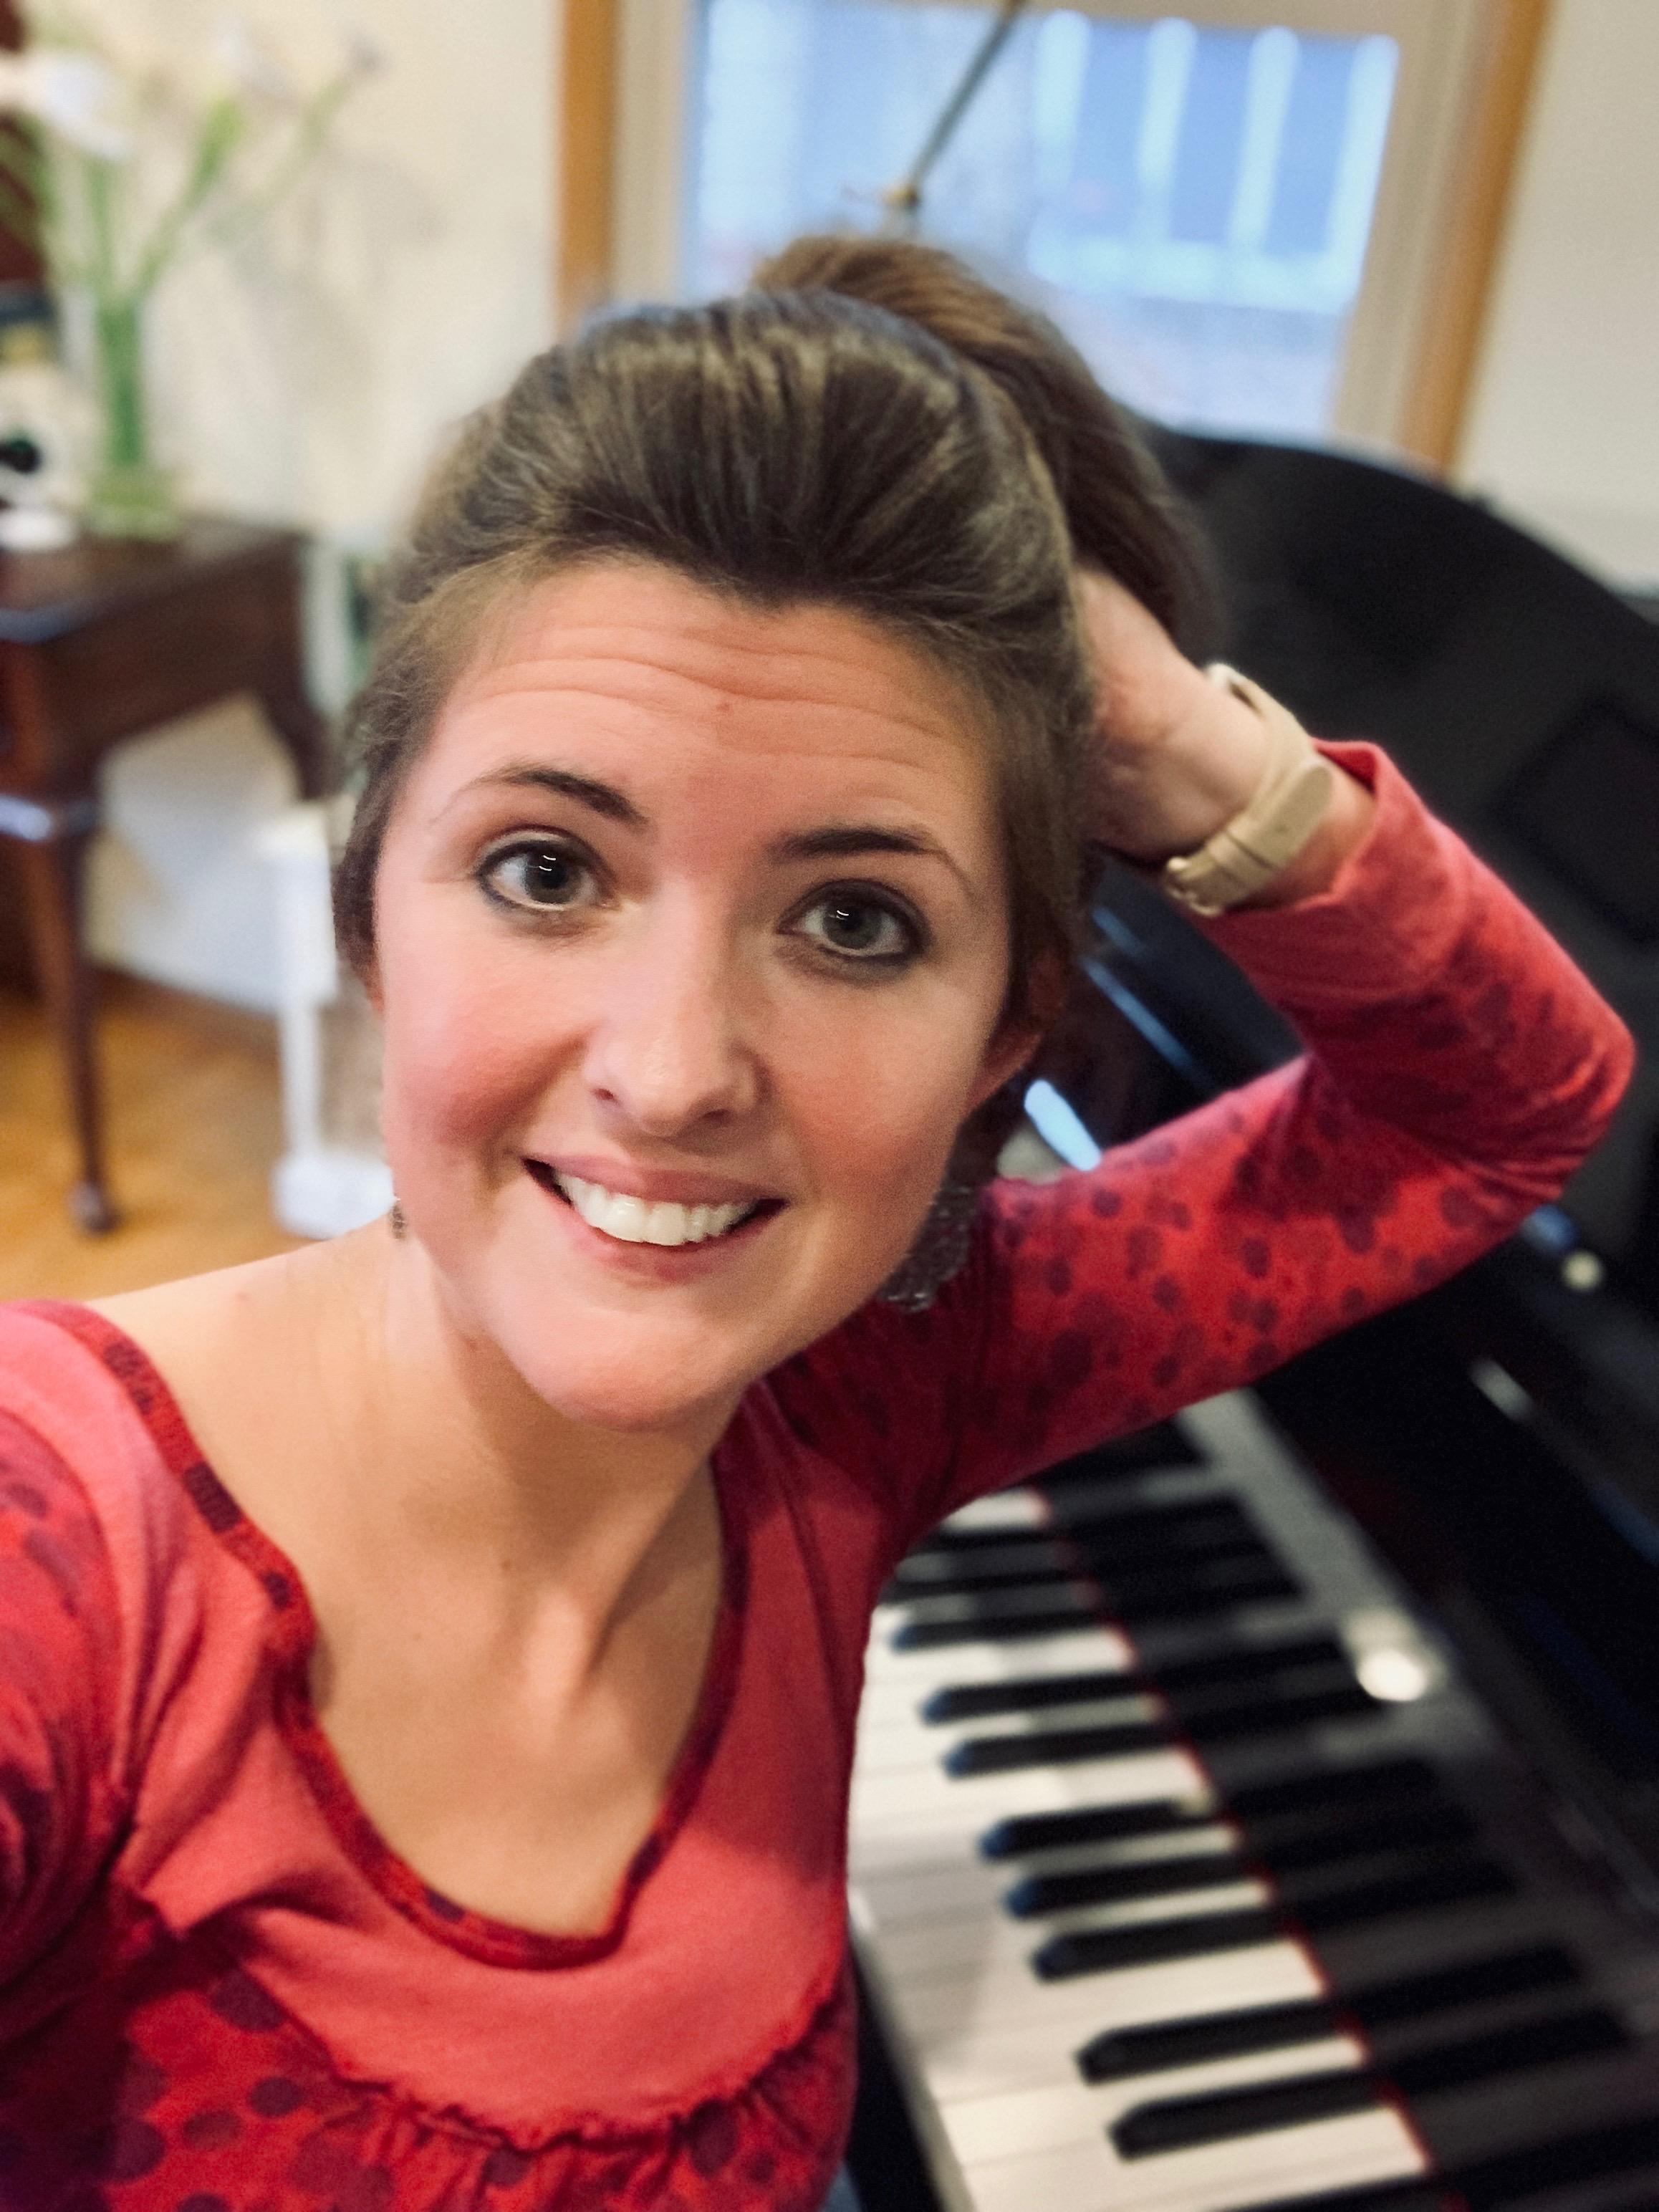 Erica Ogden